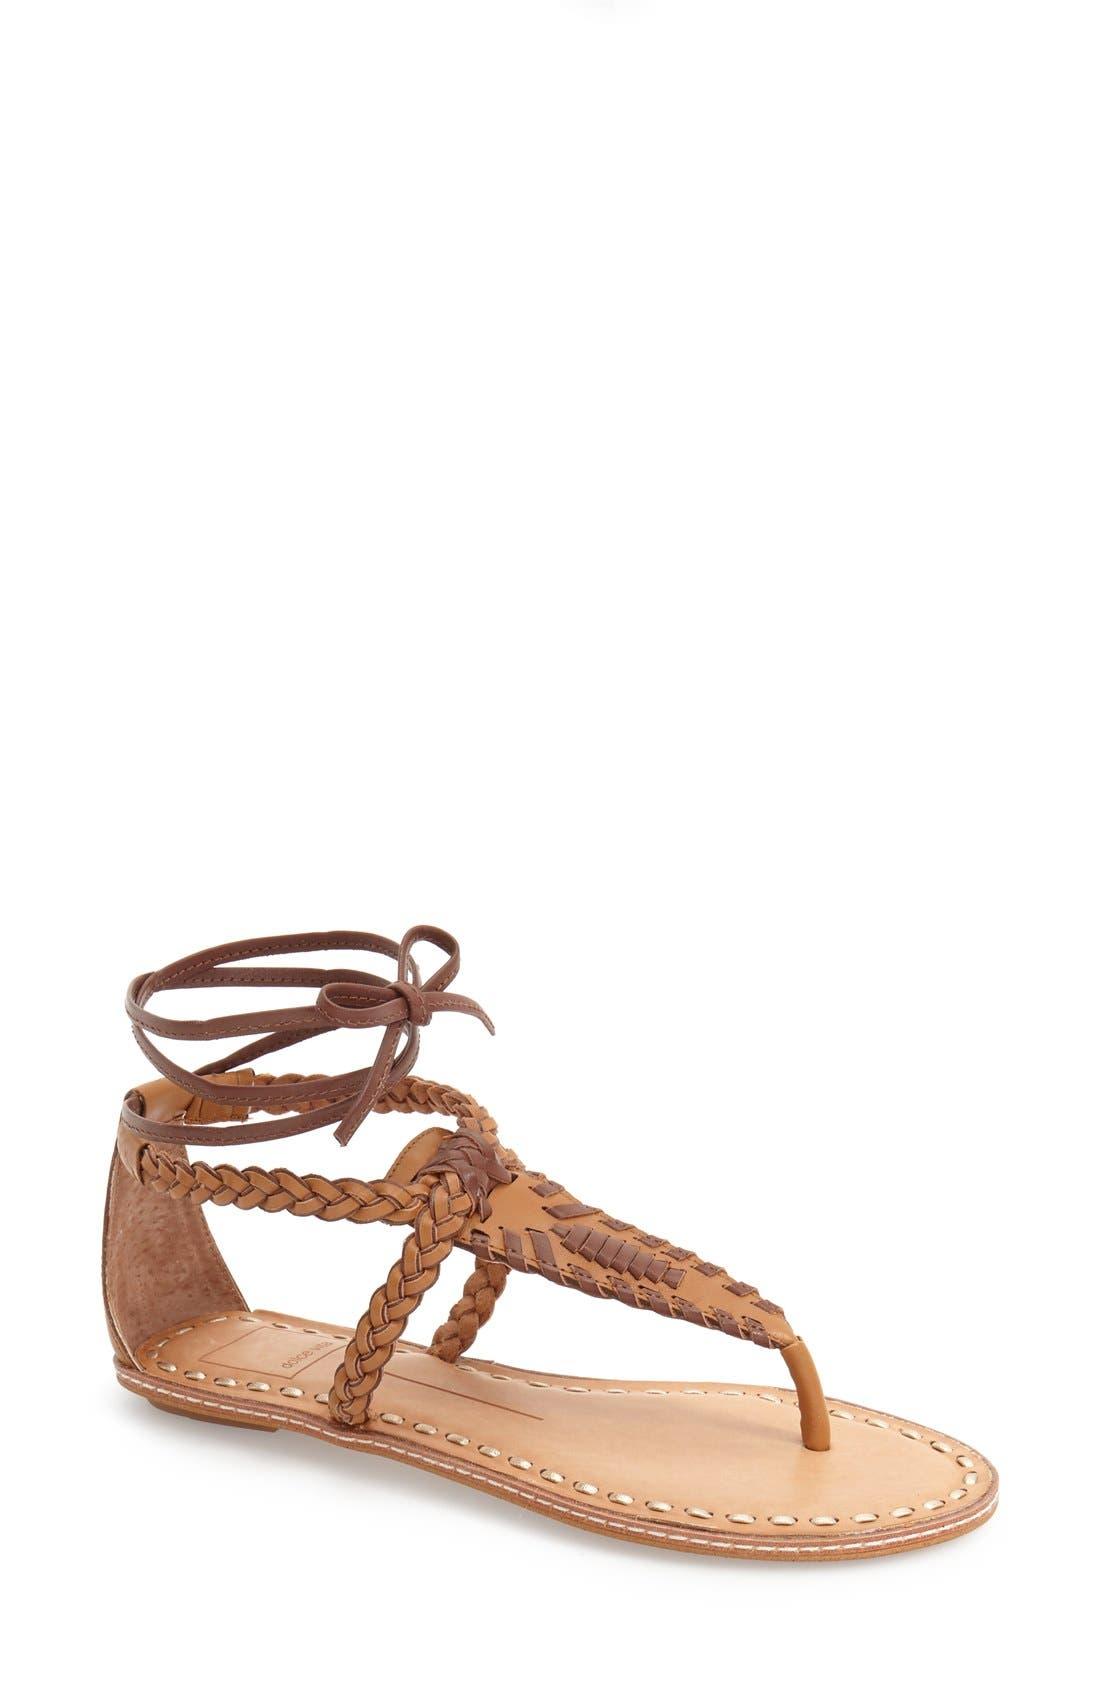 Alternate Image 1 Selected - Dolce Vita 'Keoni' Flat Sandal (Women)